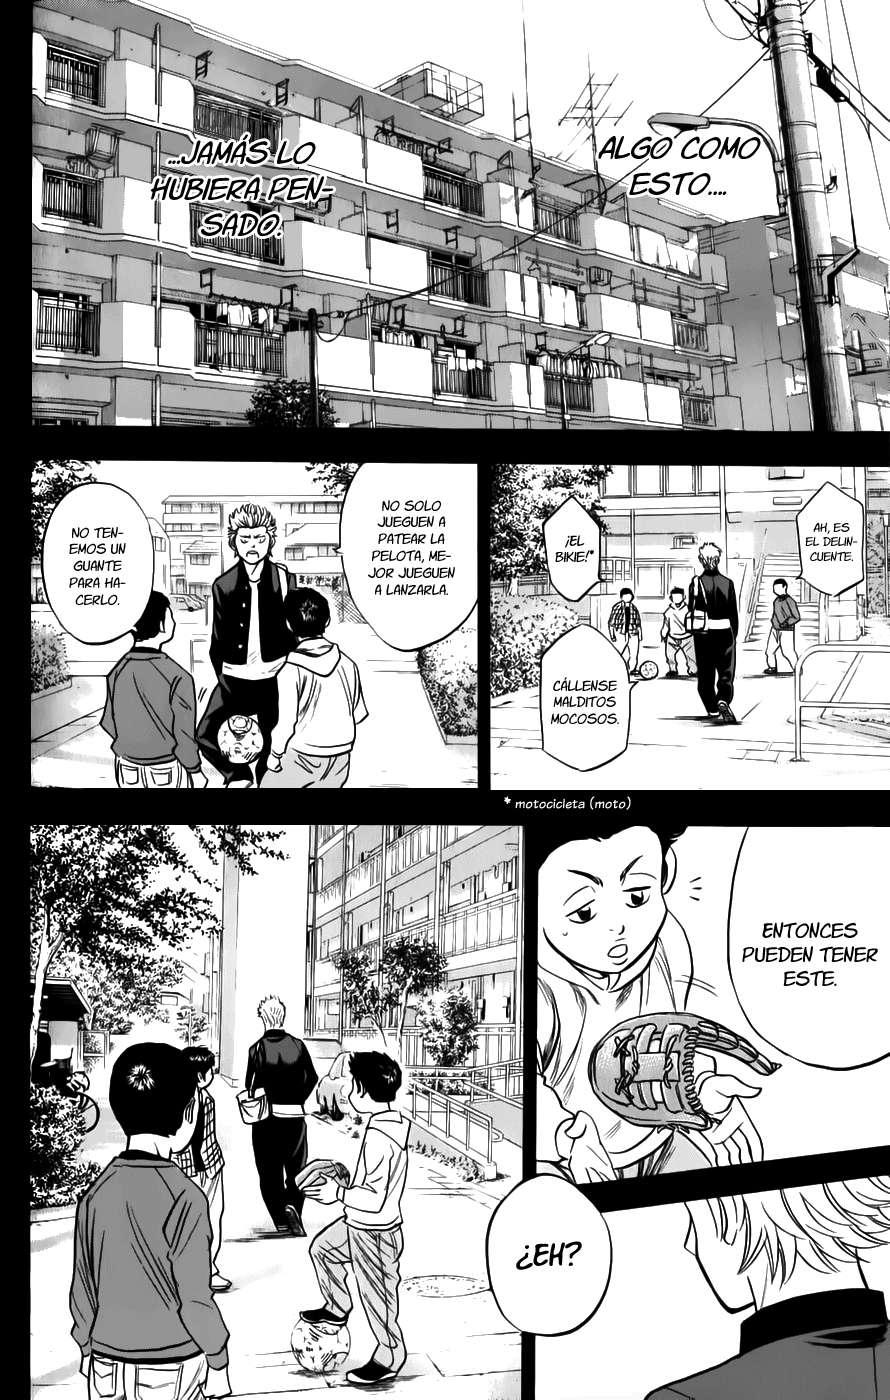 http://c5.ninemanga.com/es_manga/24/1752/395648/b56669fbdab303dea8afe5483fe4c3ad.jpg Page 7